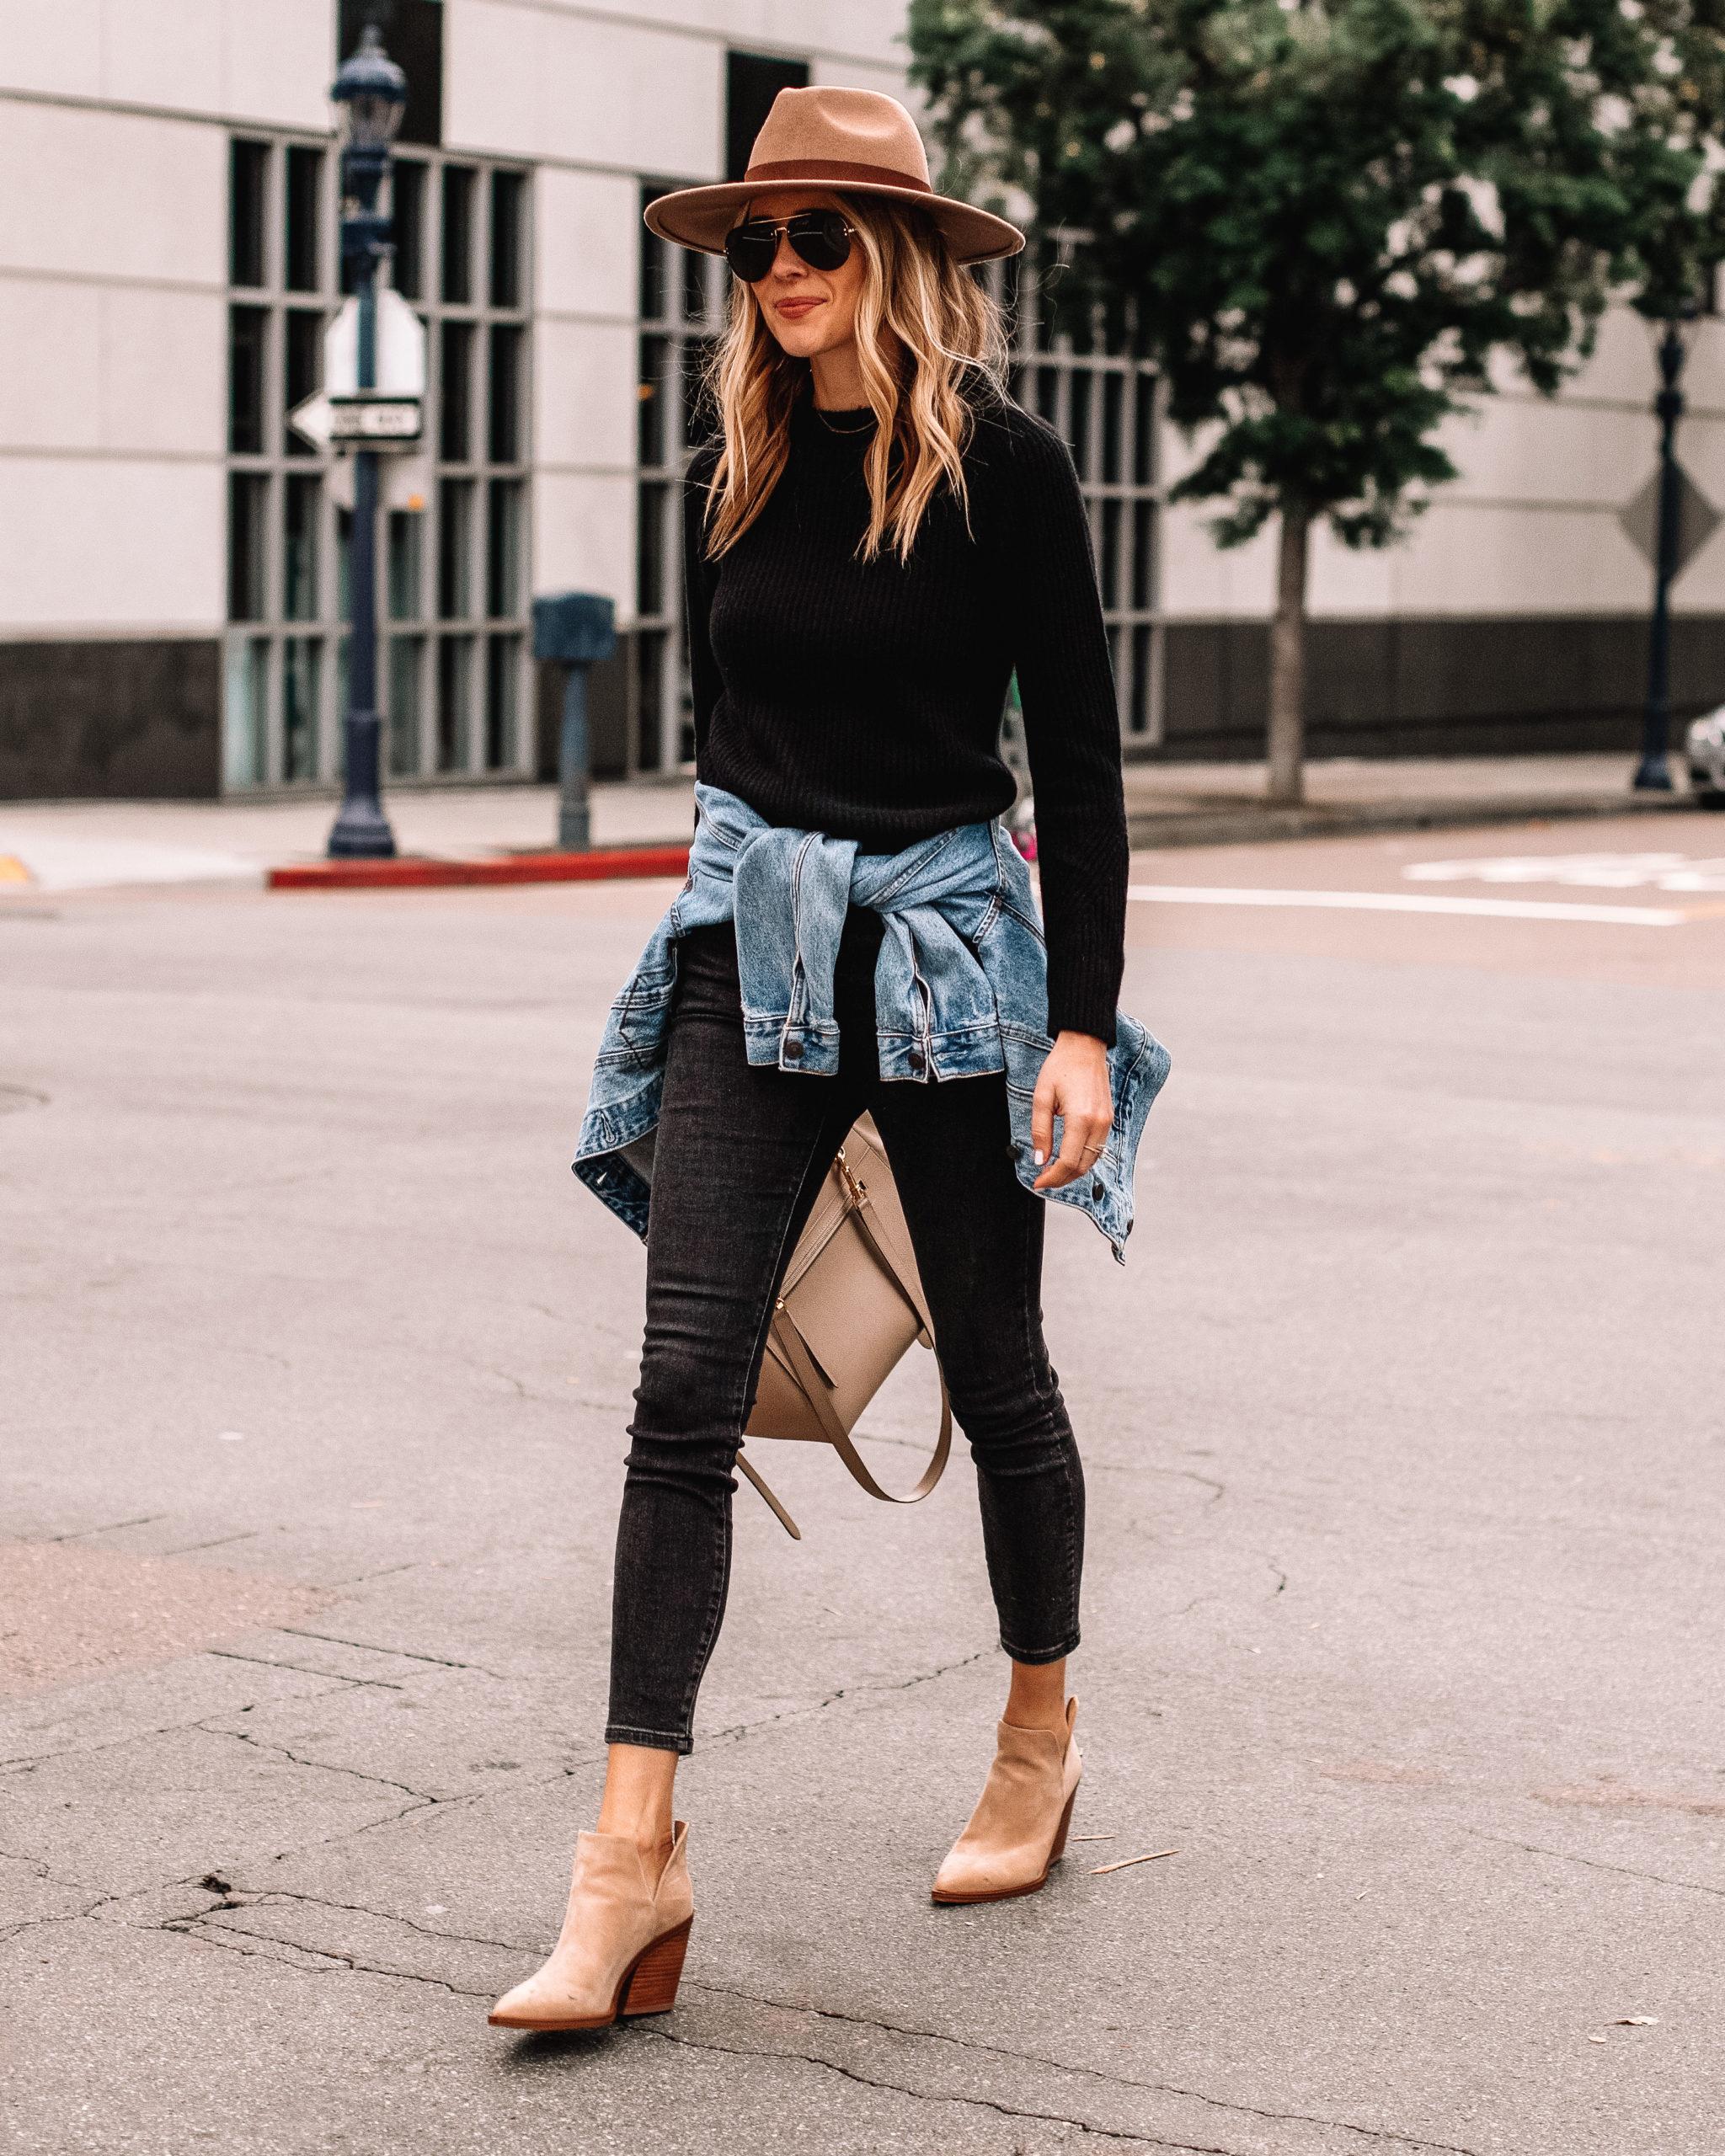 Fashion Jackson Wearing Brown Hat Black Sweater Black Skinny Jeans Denim Jacket Tan Booties